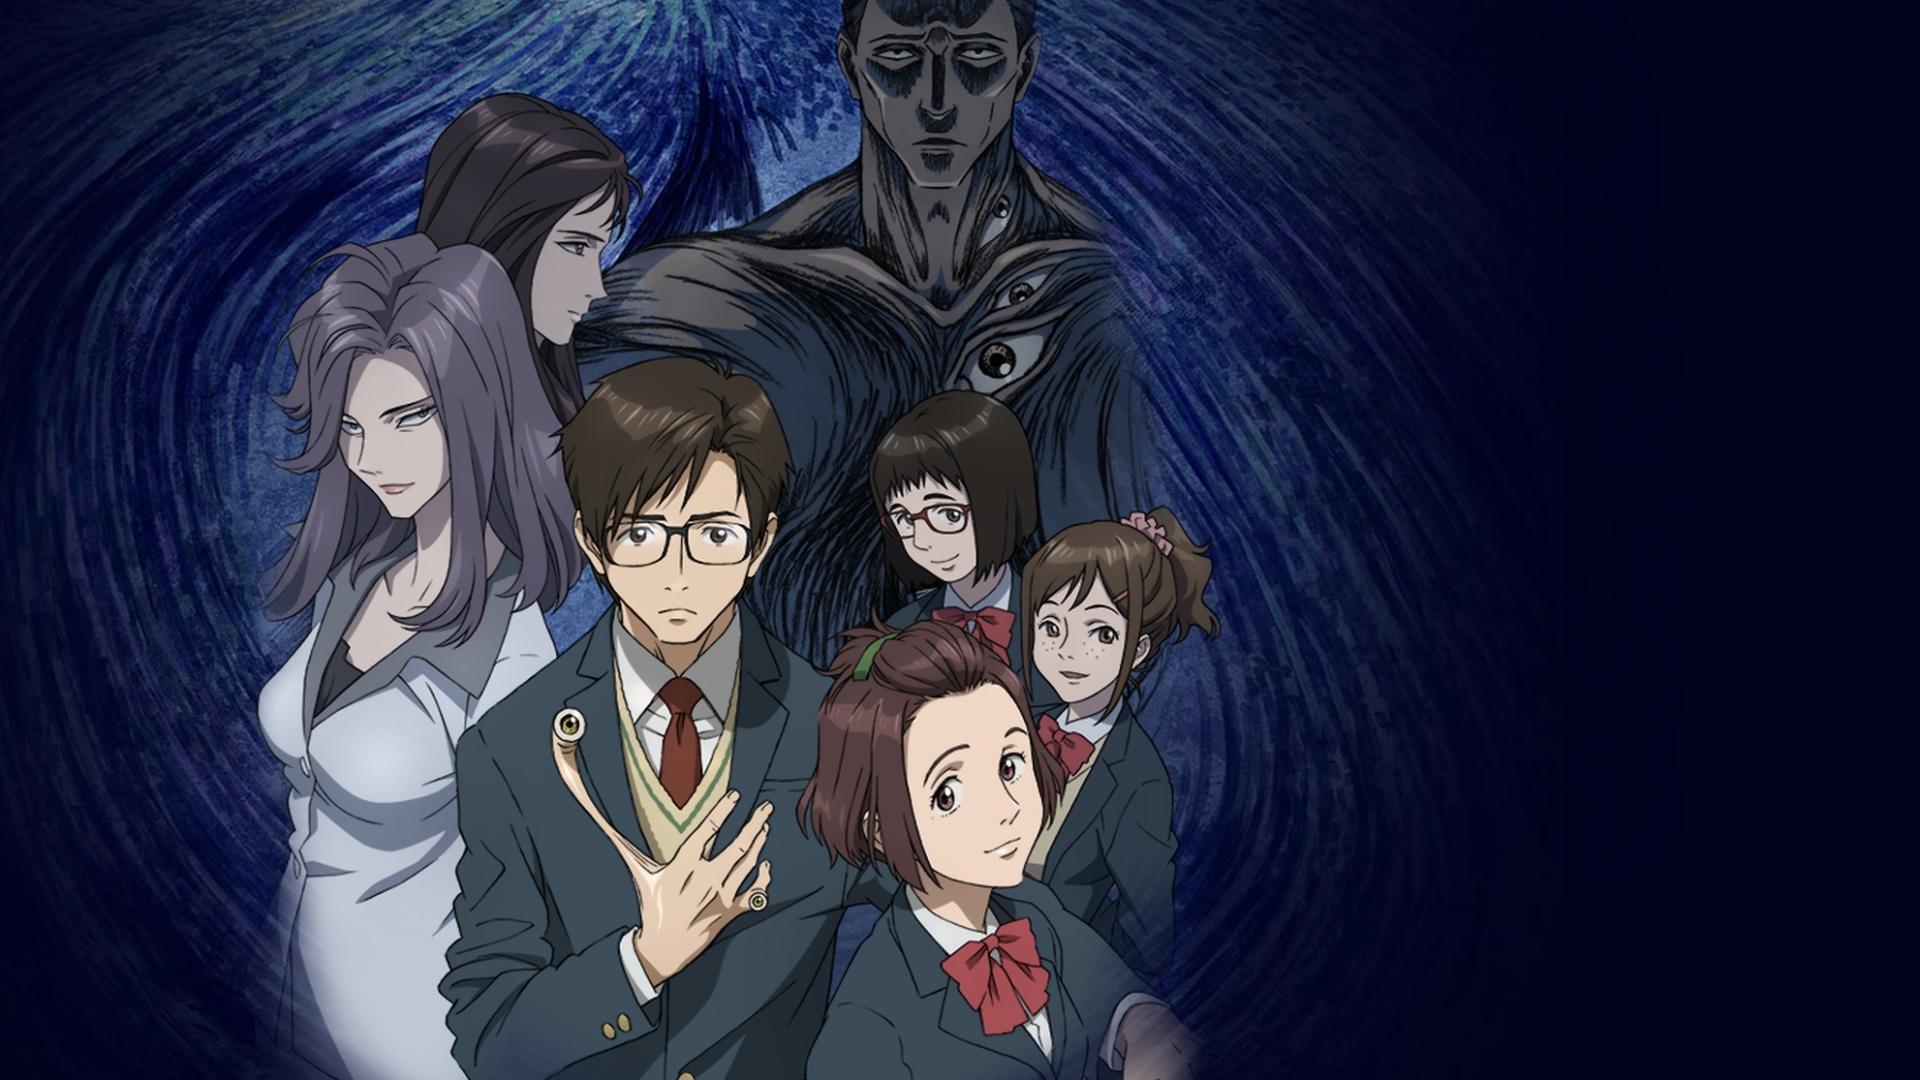 The Best Single-Season Anime To Stream Like Death Note